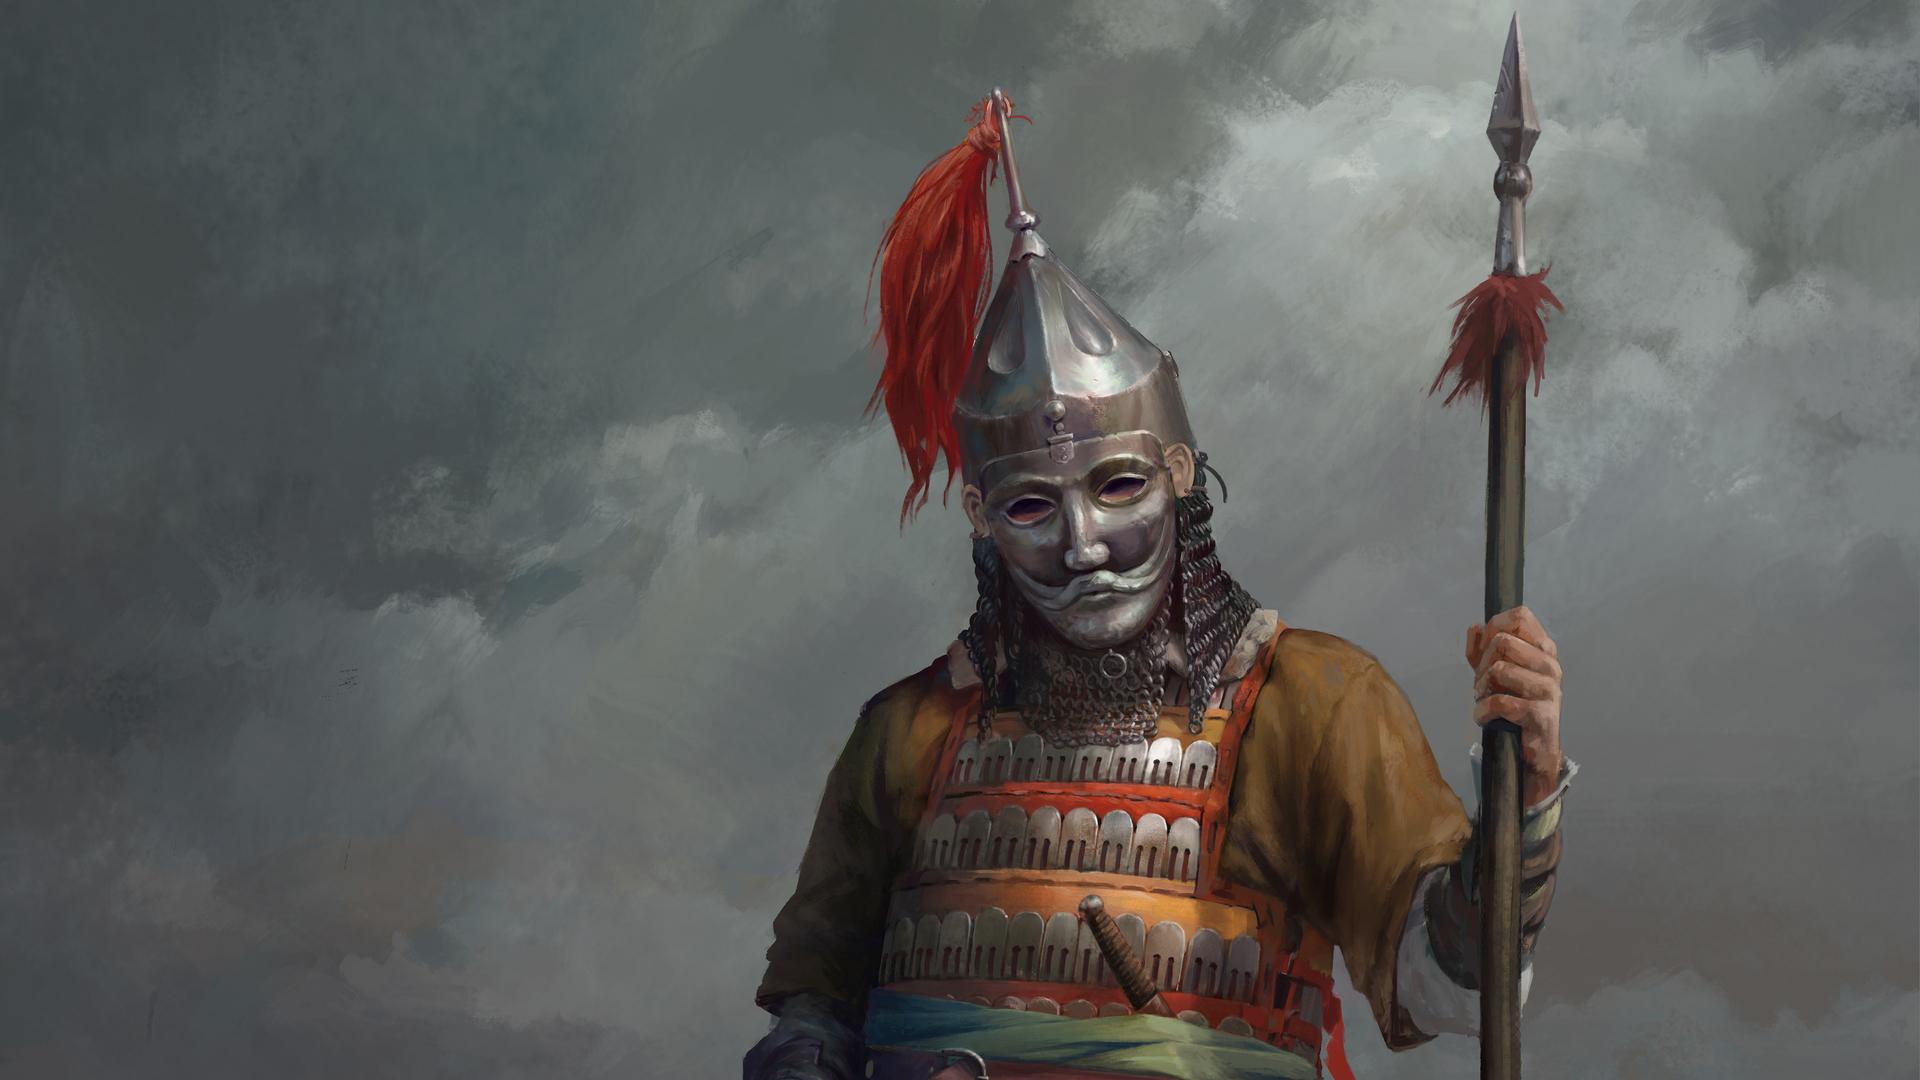 Cuman warrior Wallpaper from Kingdom Come Deliverance 1920x1080